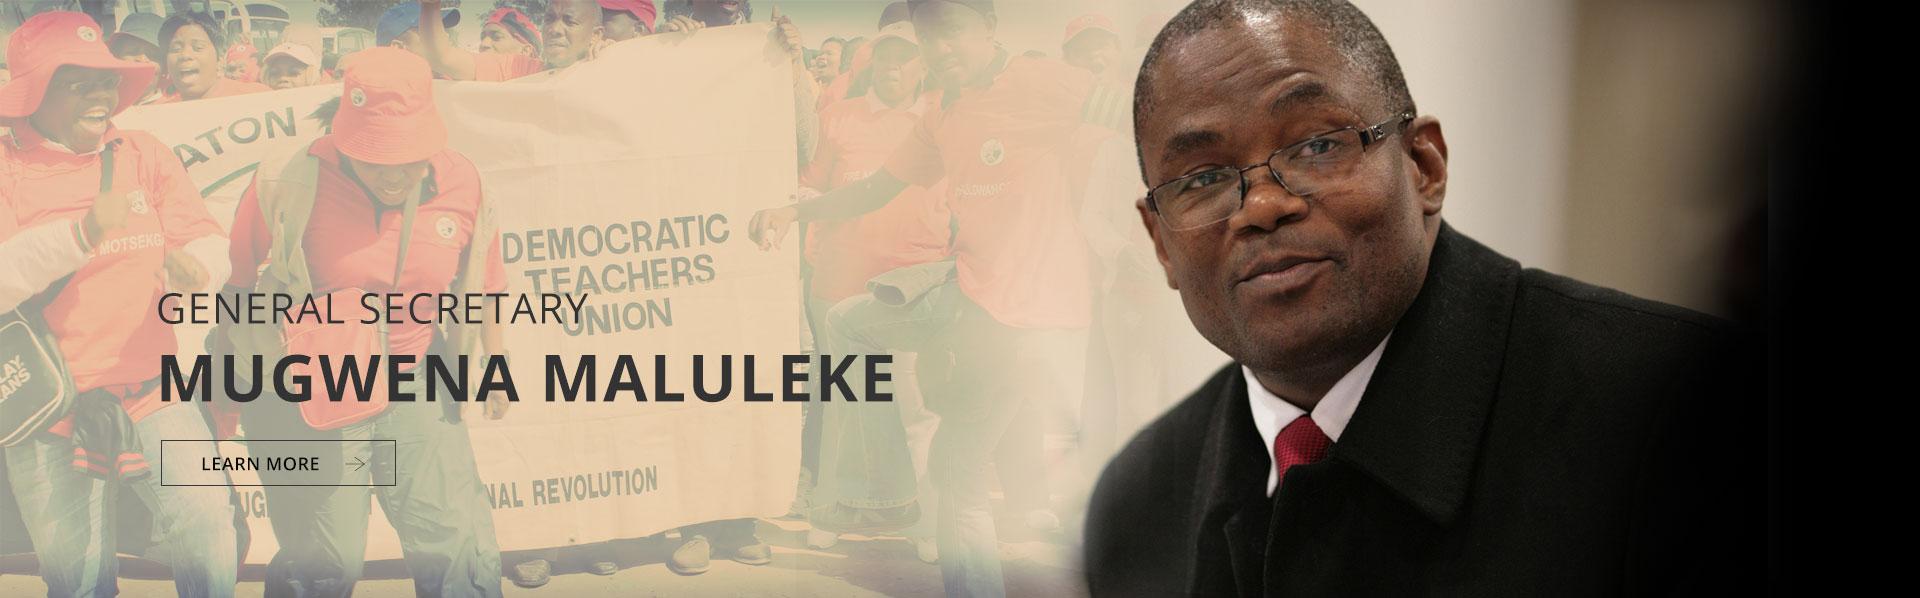 General Secretary: Cde Mugwena John Maluleke